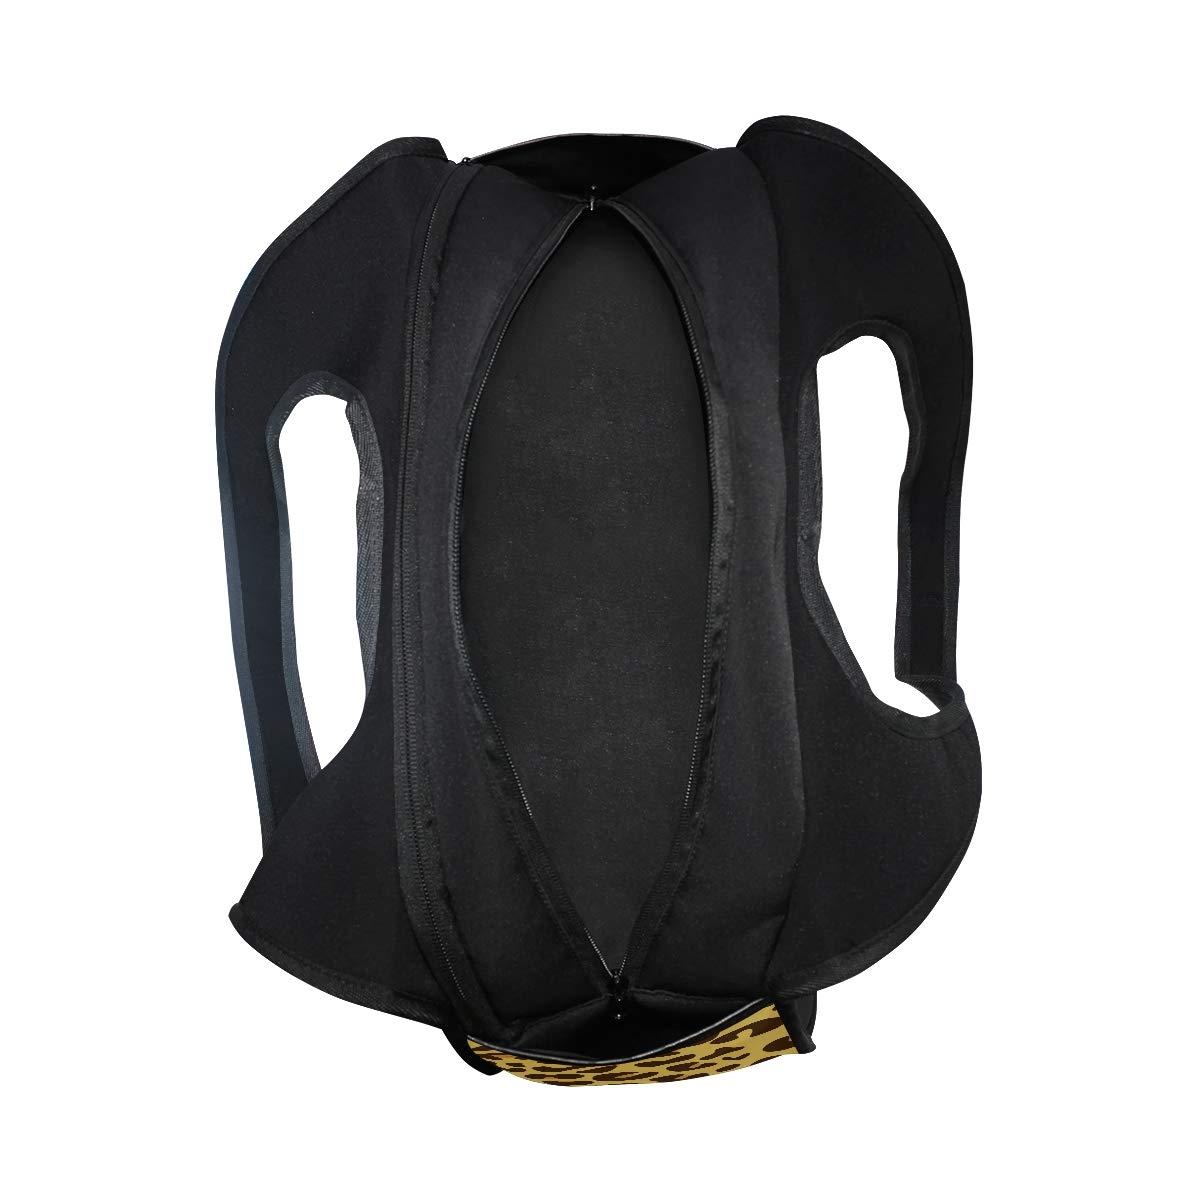 Animal Leopard Print Women Sports Gym Totes Bag Multi-Function Nylon Travel Shoulder Bag